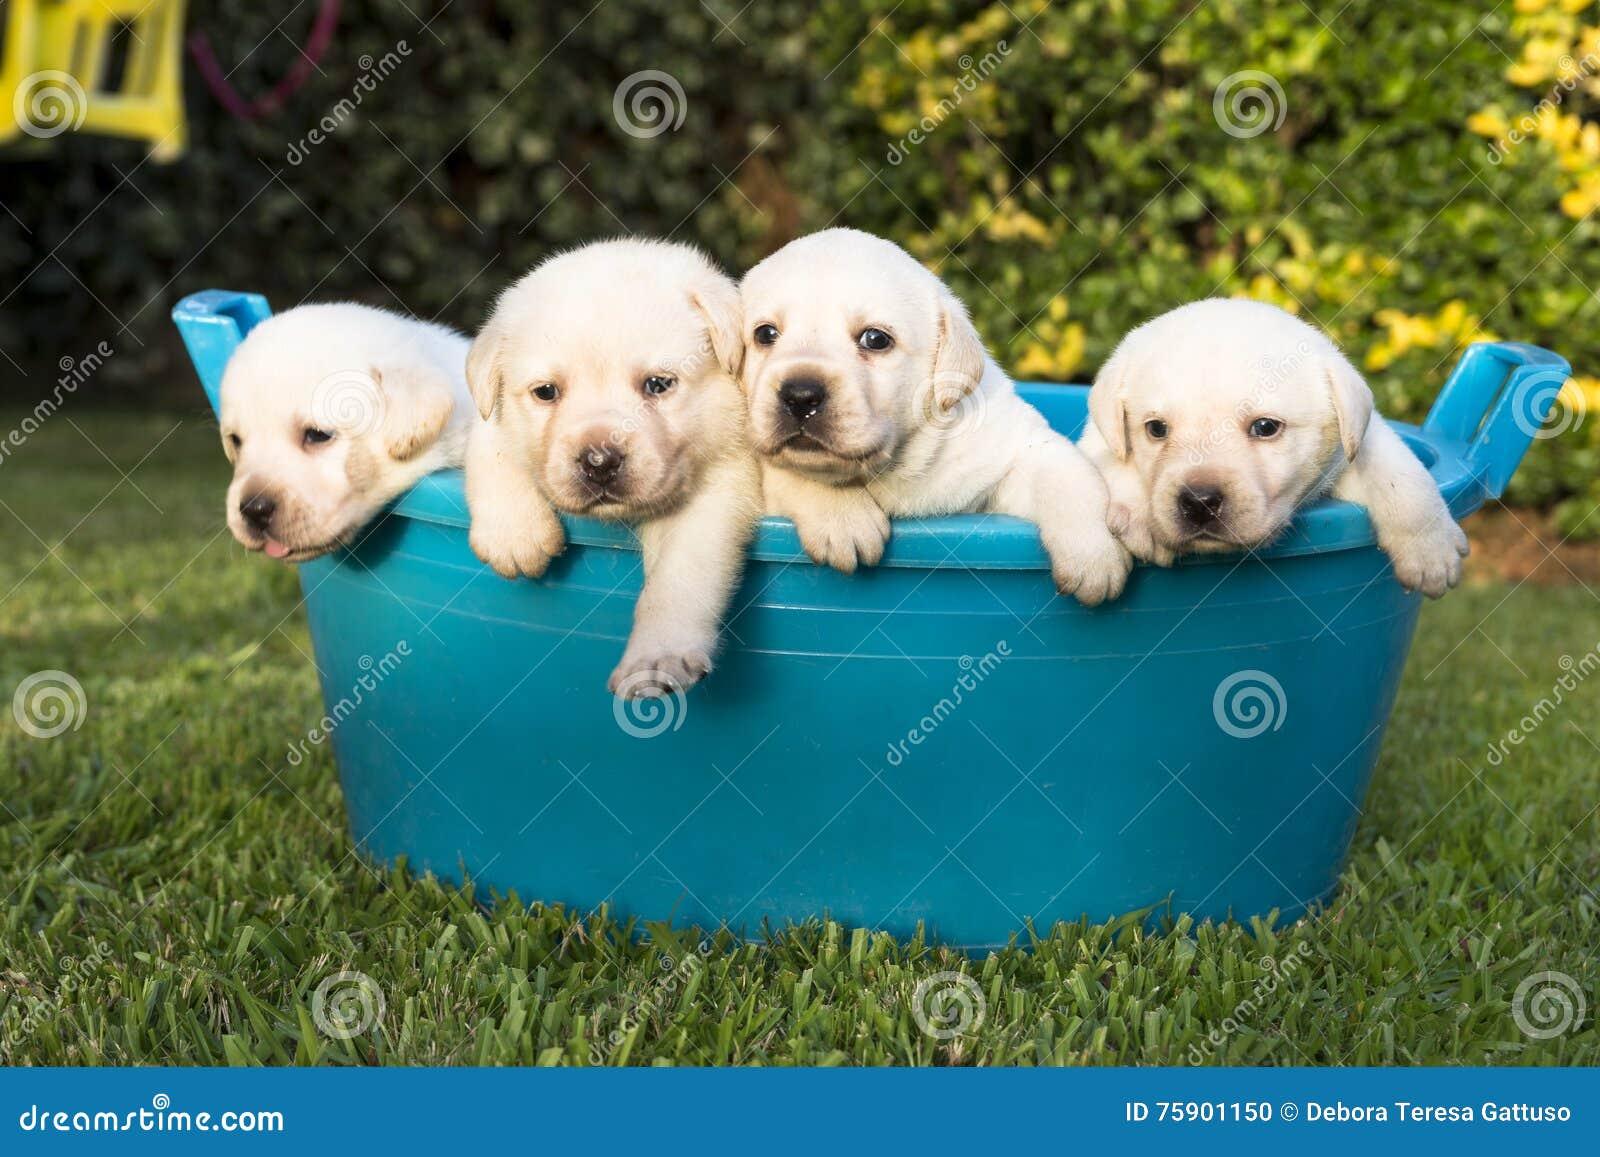 Puppies having a summer bath